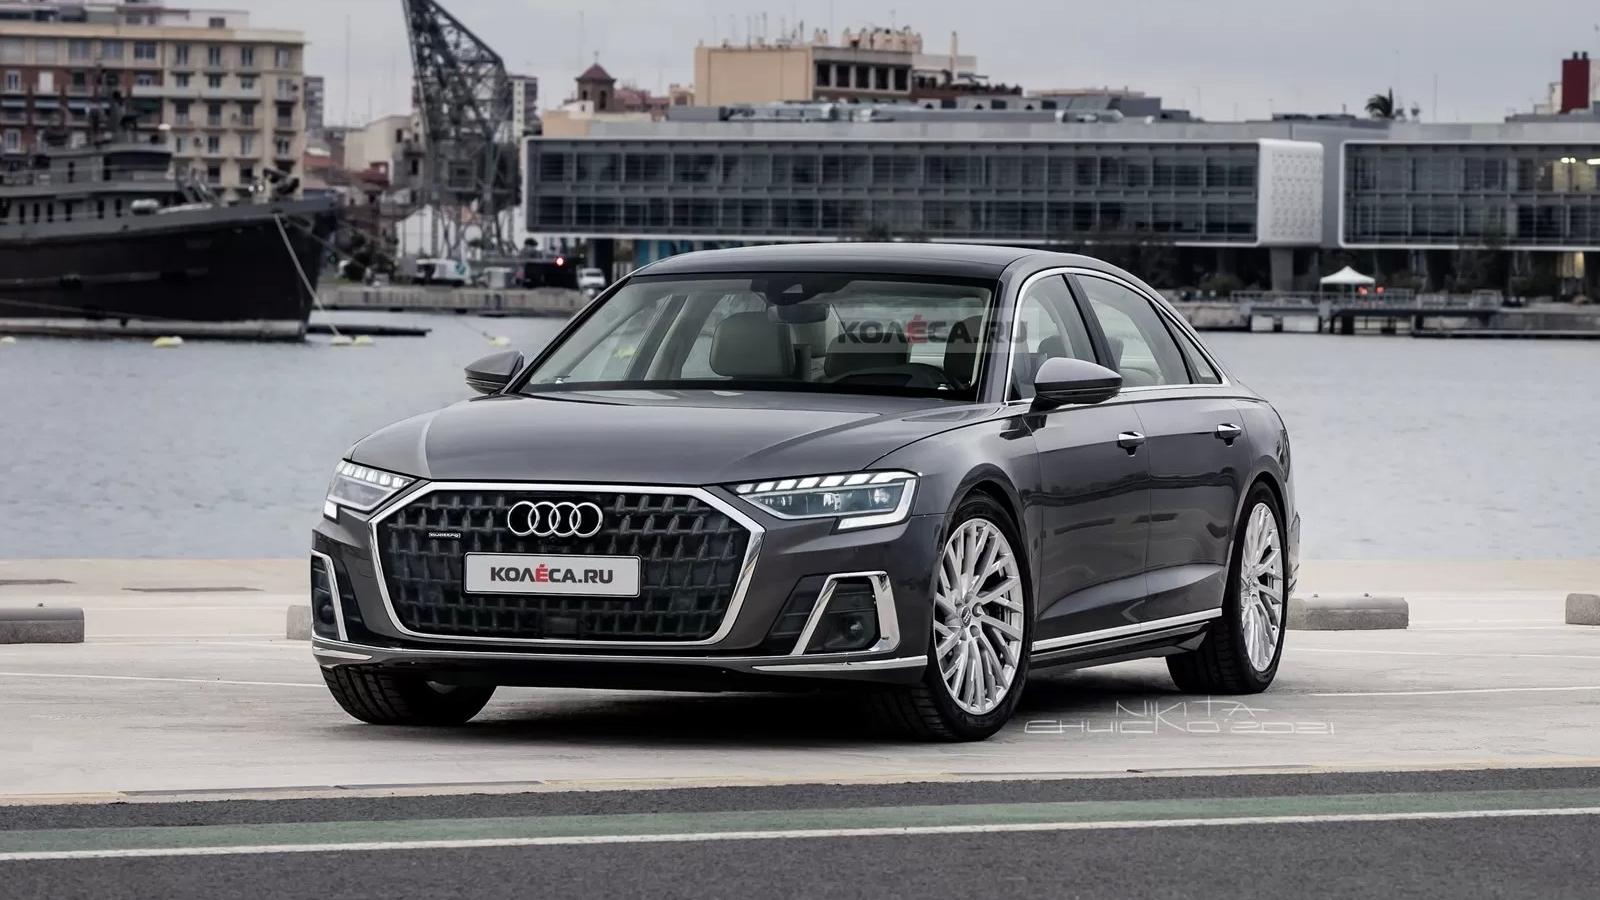 Khám phá Audi A8 2022 bản nâng cấp